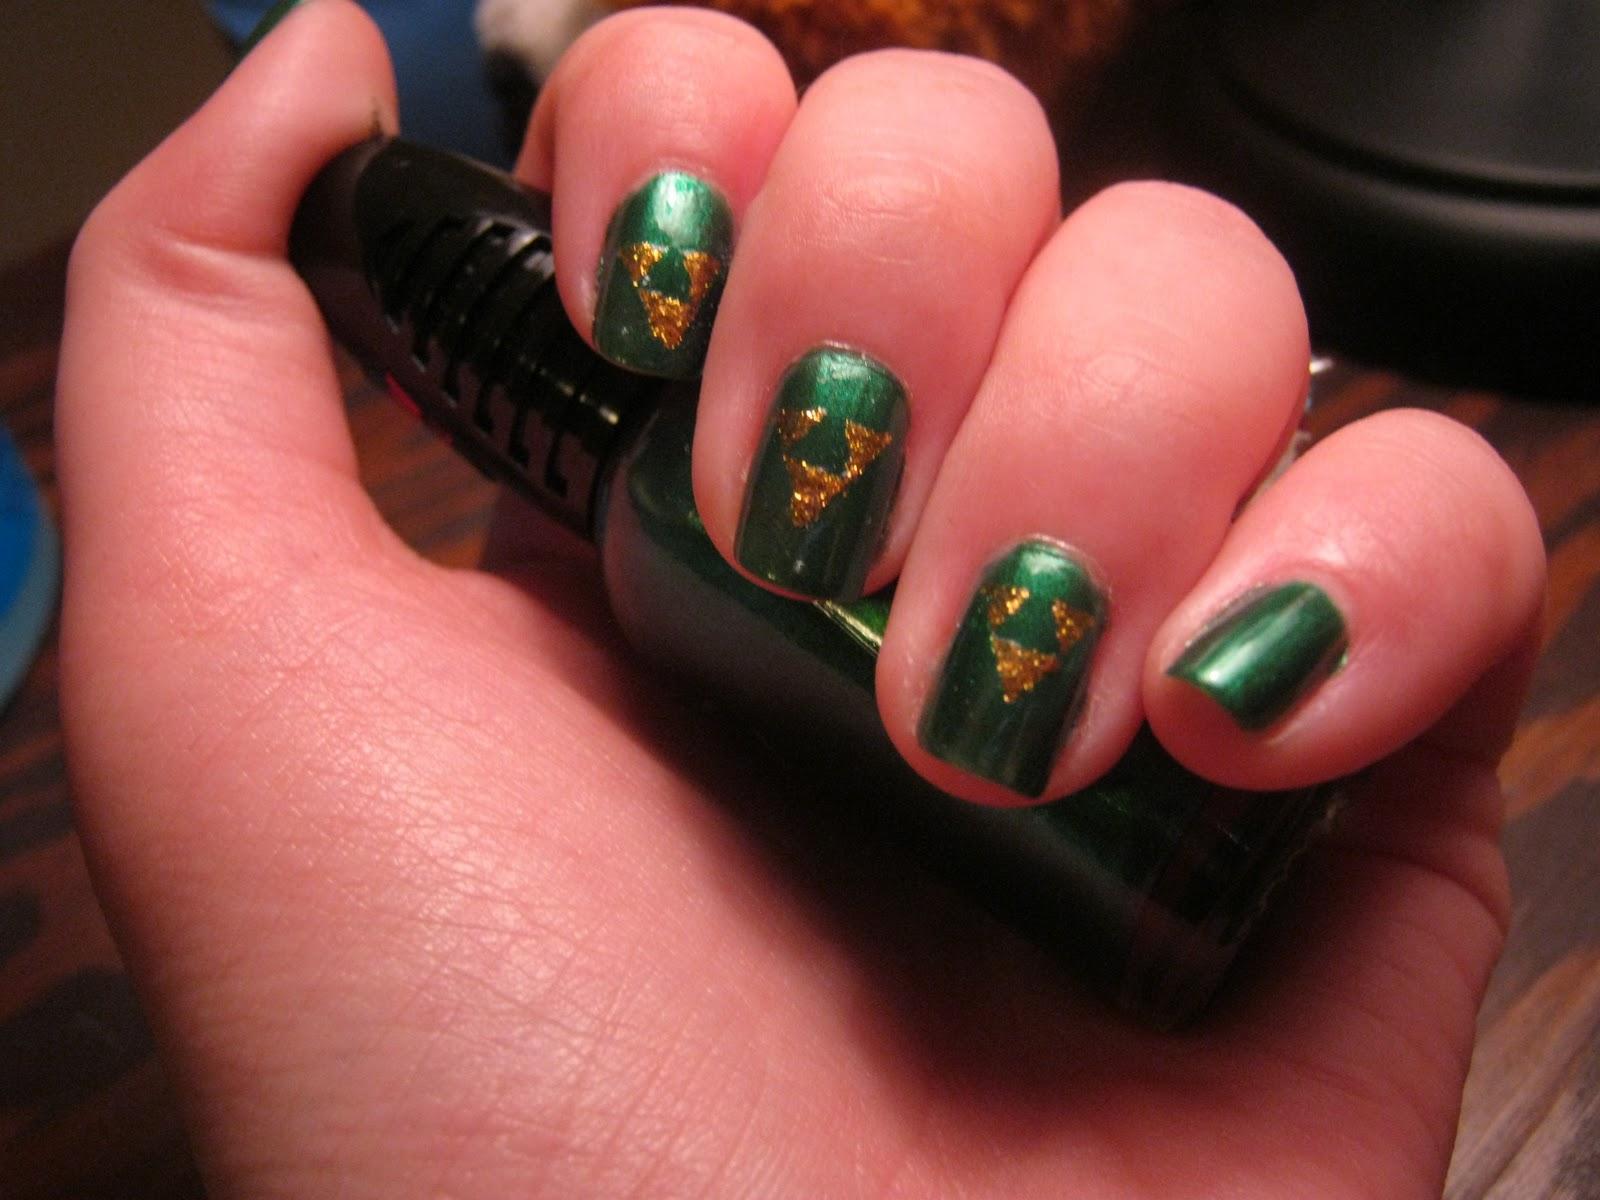 Munchy S Nails Zelda Nails